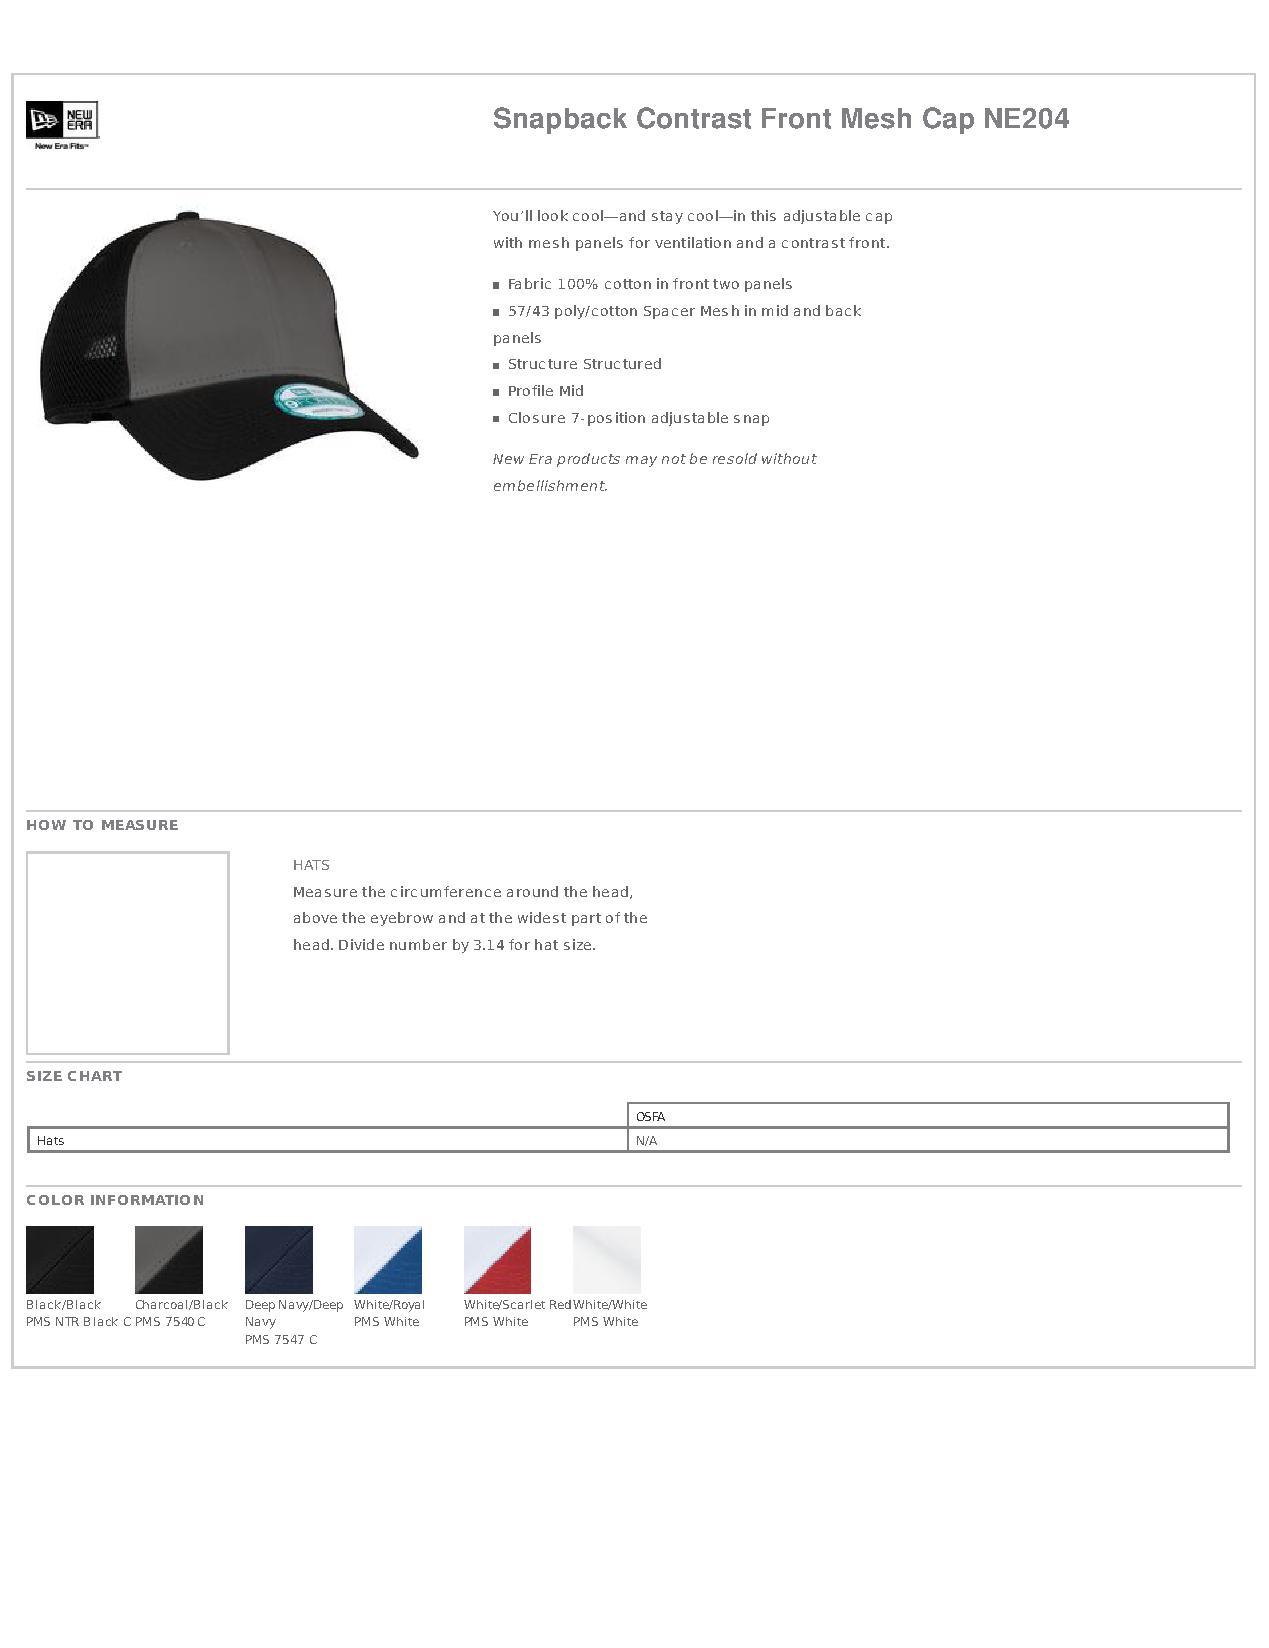 e9db8a19fa7d3 New Era® NE204 Snapback Contrast Front Mesh Cap - Headwear